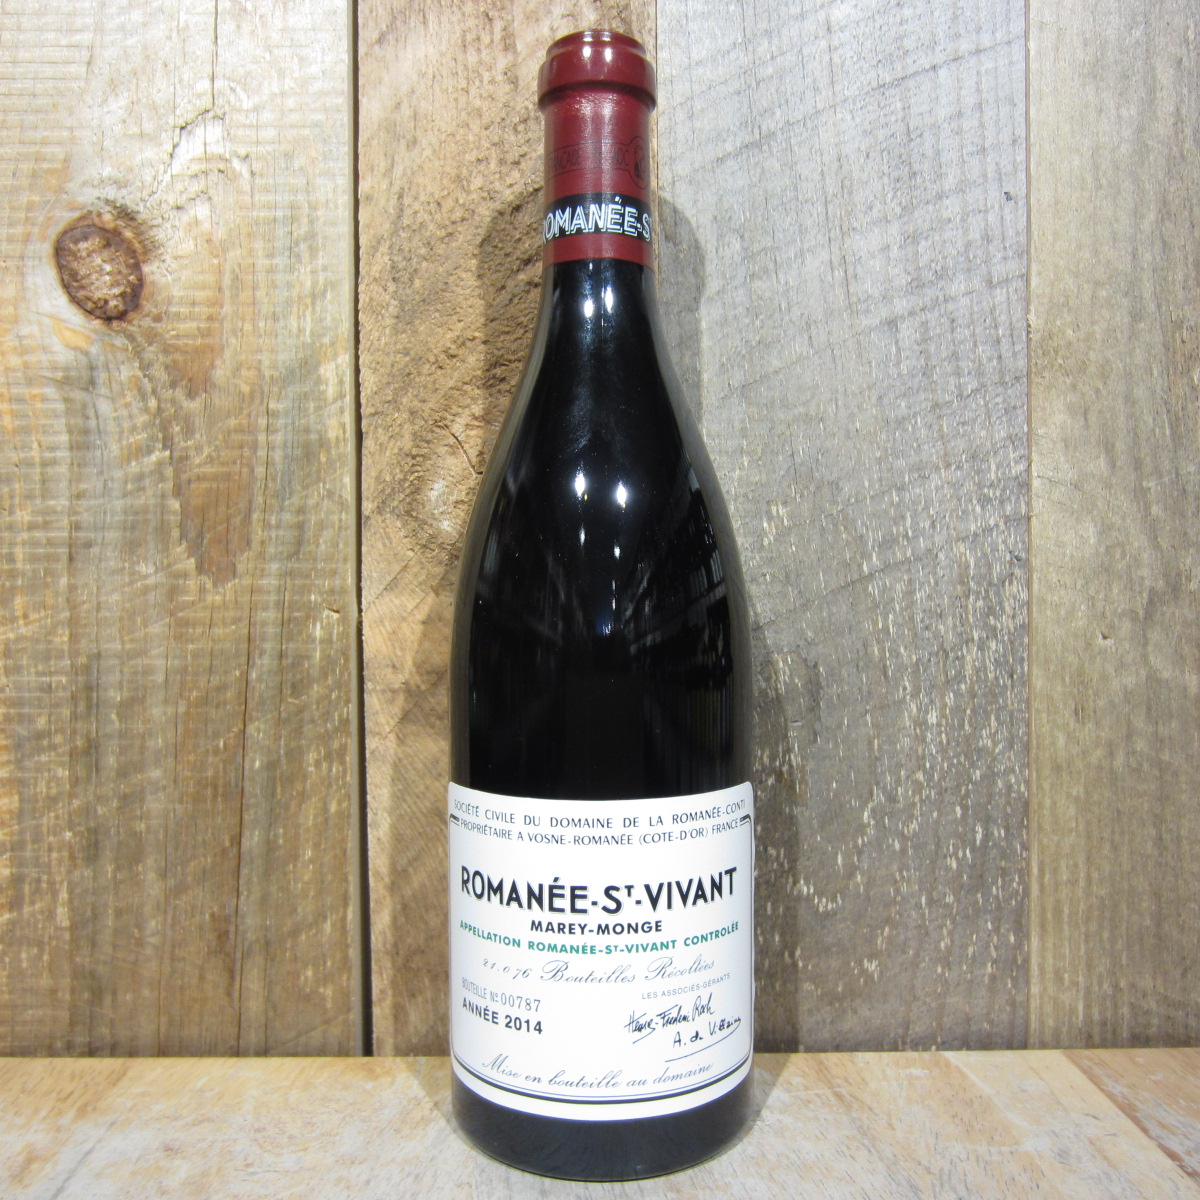 Domaine de La Romanee Conti Romanee Saint Vivant 2016 750ml